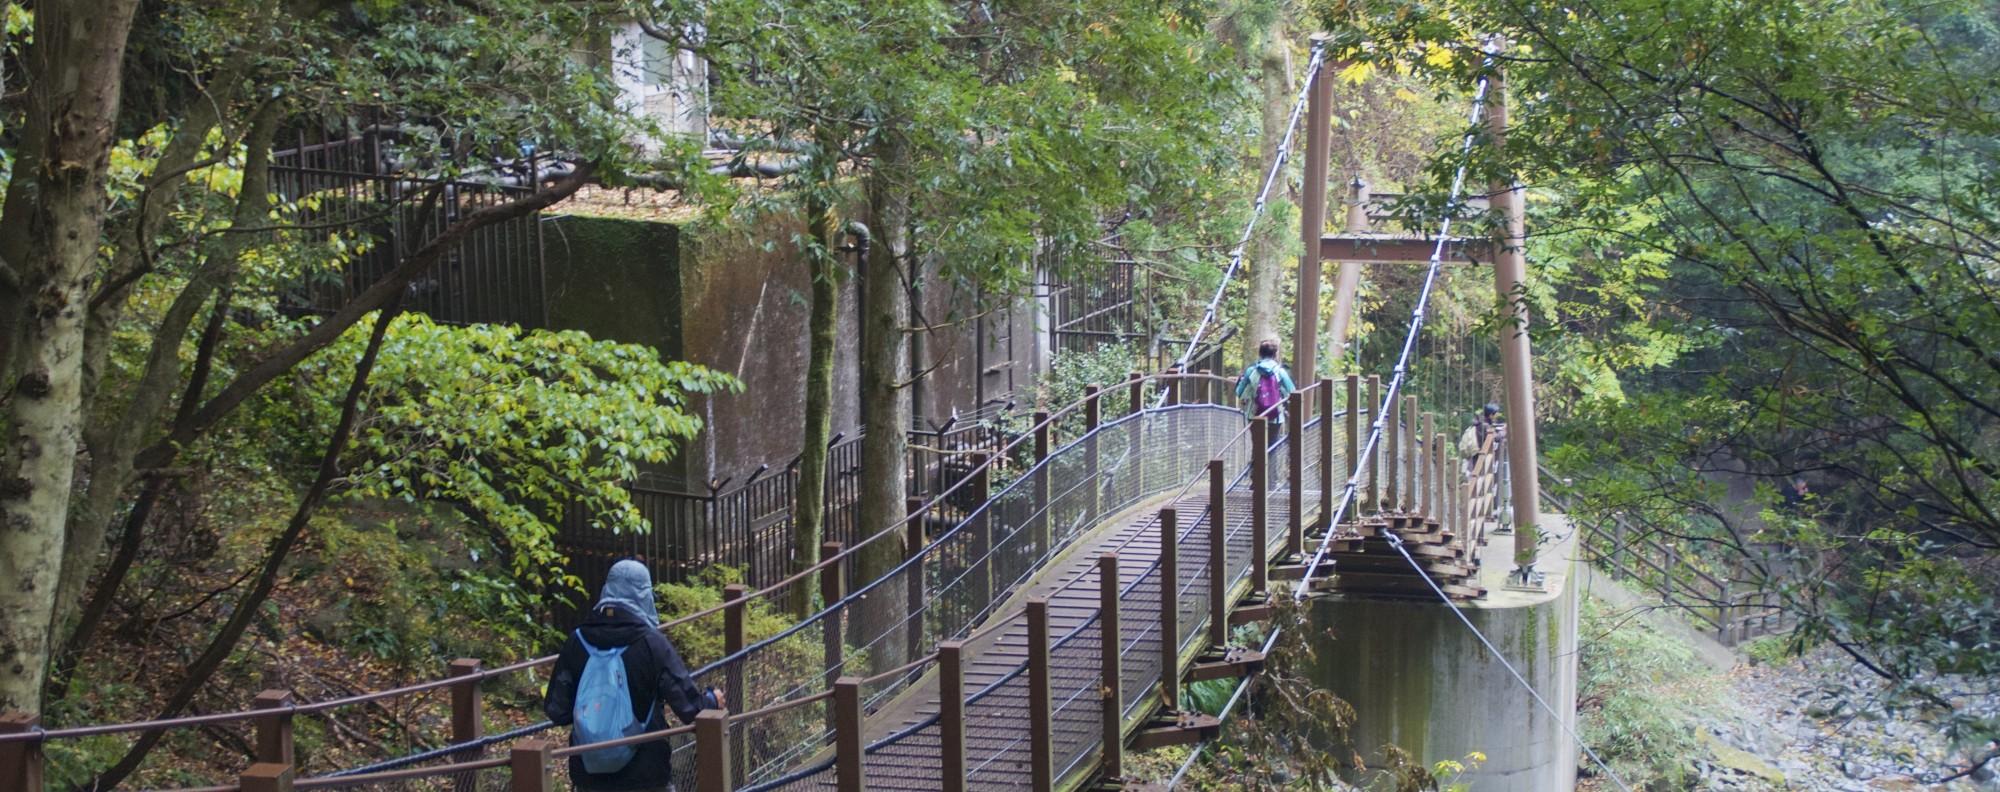 The Odoriko Trail runs down past some of the Seven Waterfalls of Kawazu.